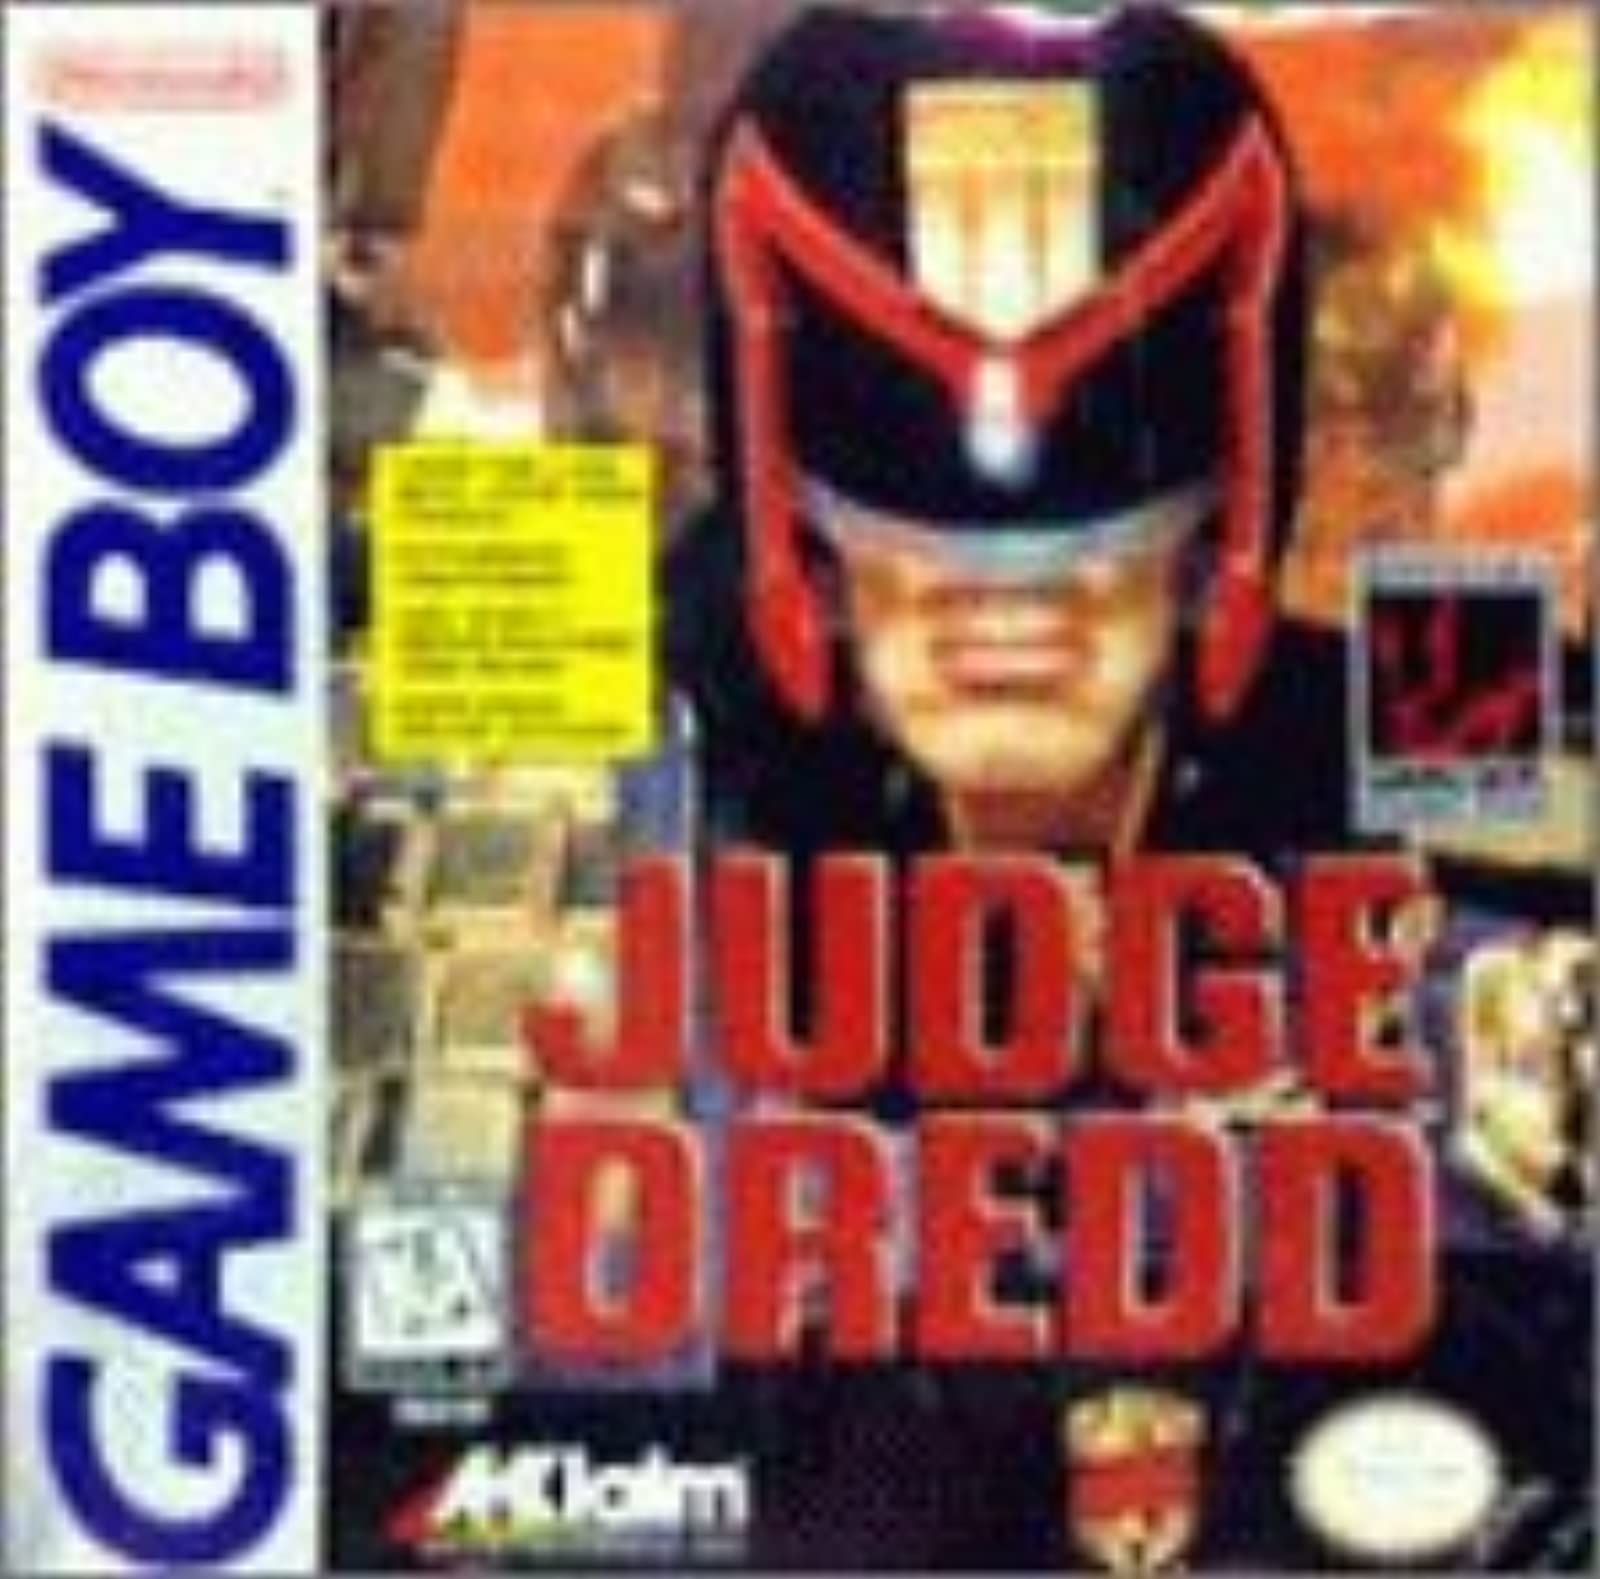 Judge Dredd On Gameboy